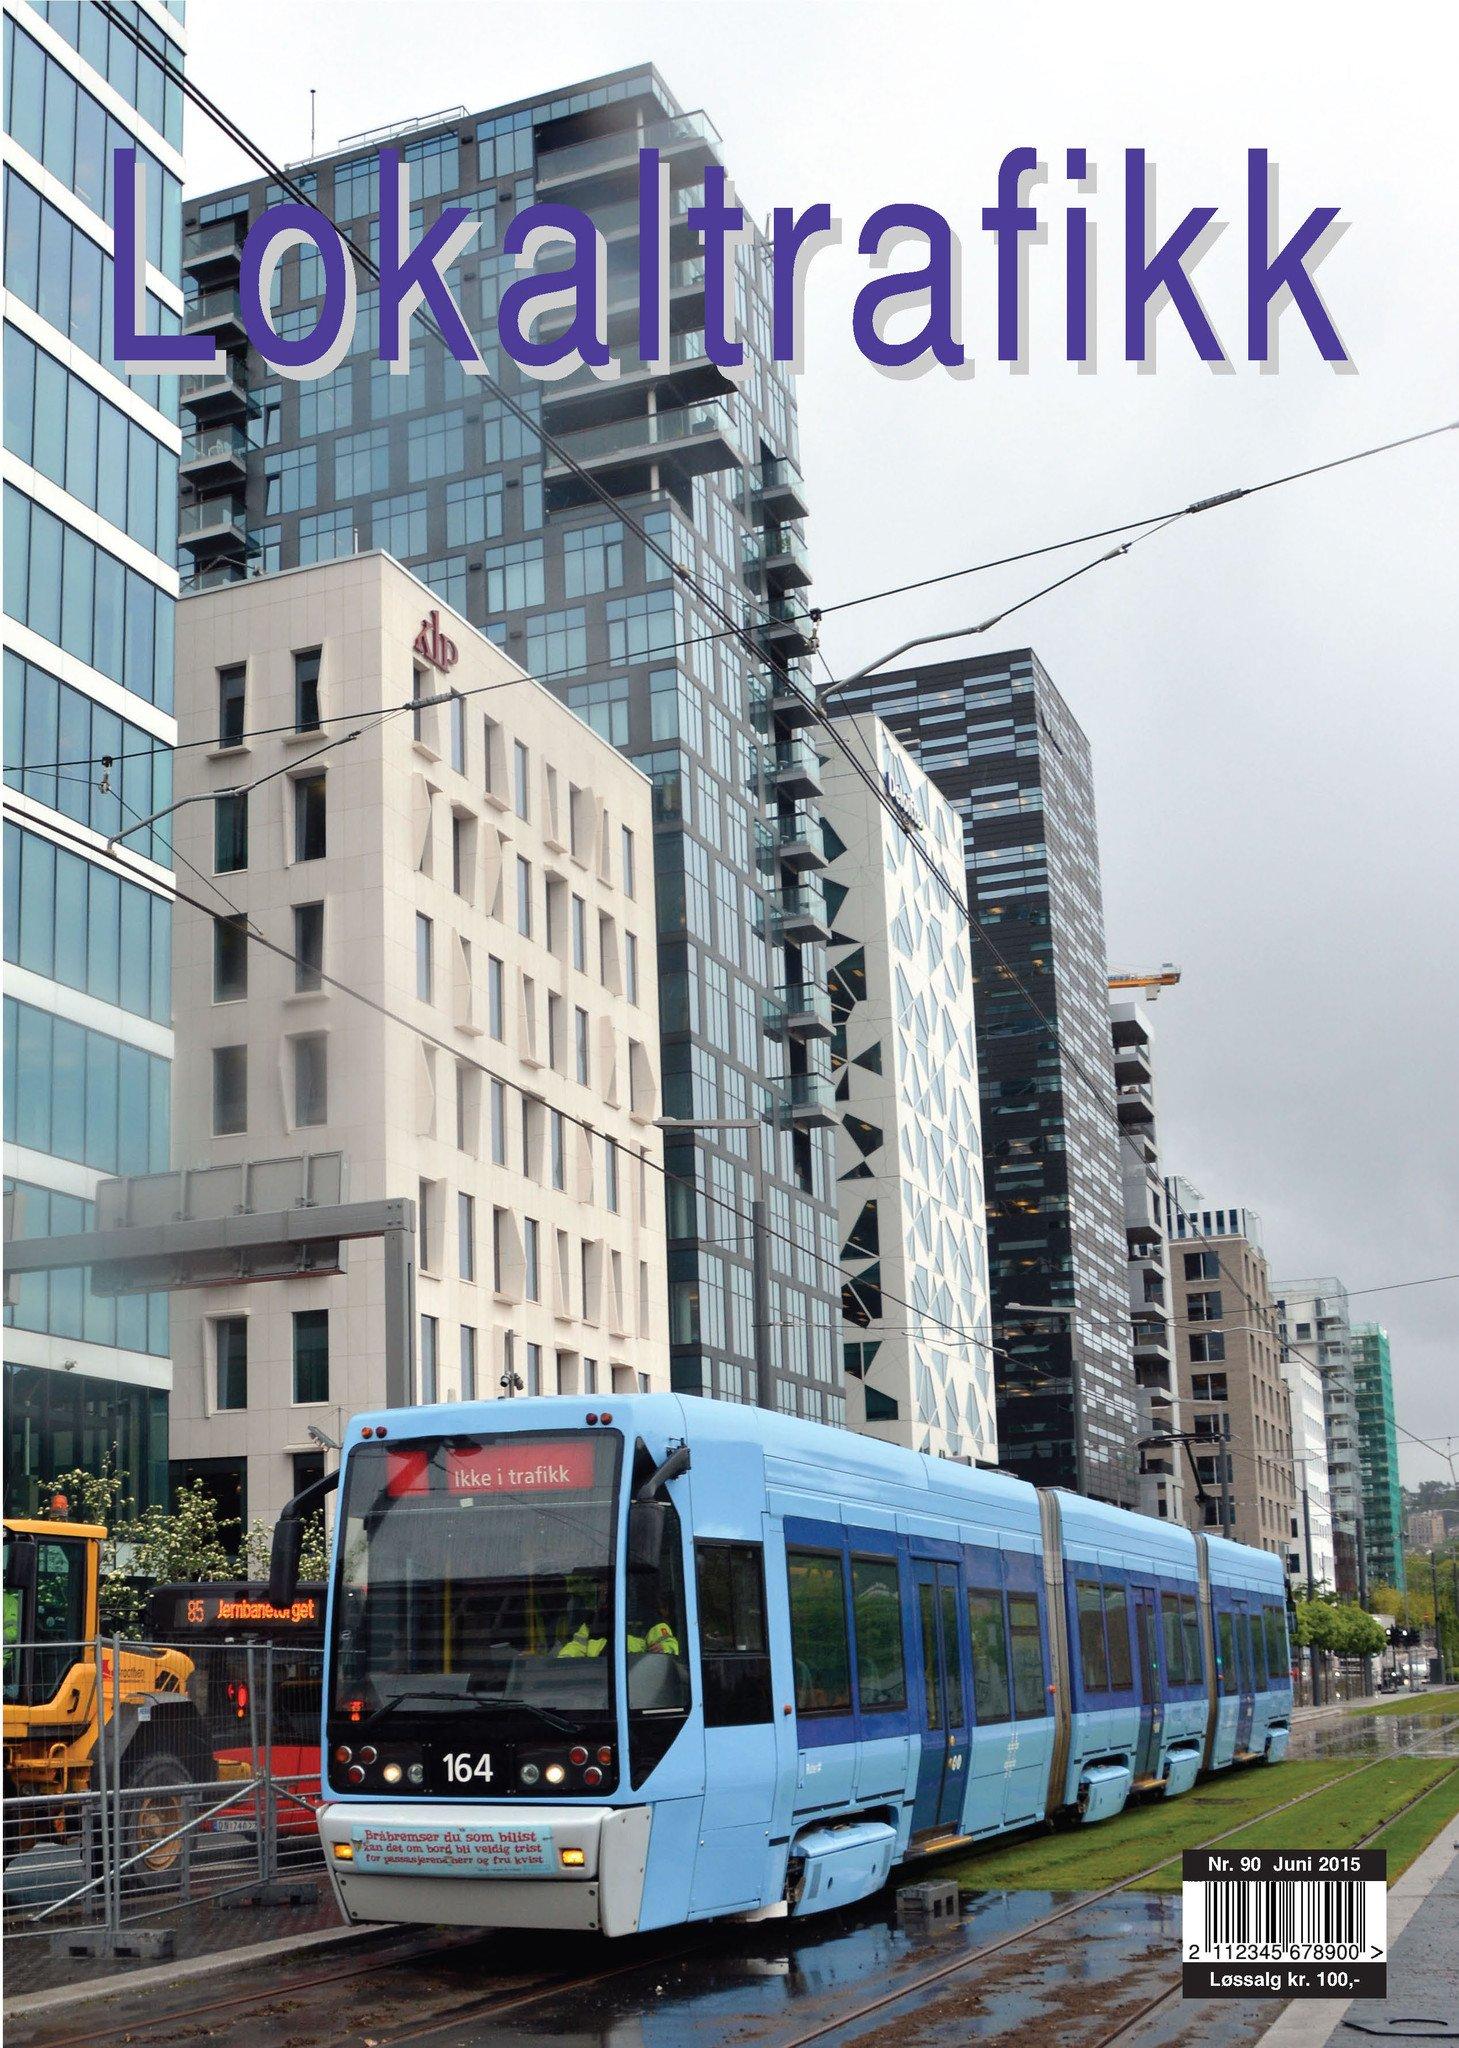 Lokaltrafikk #091